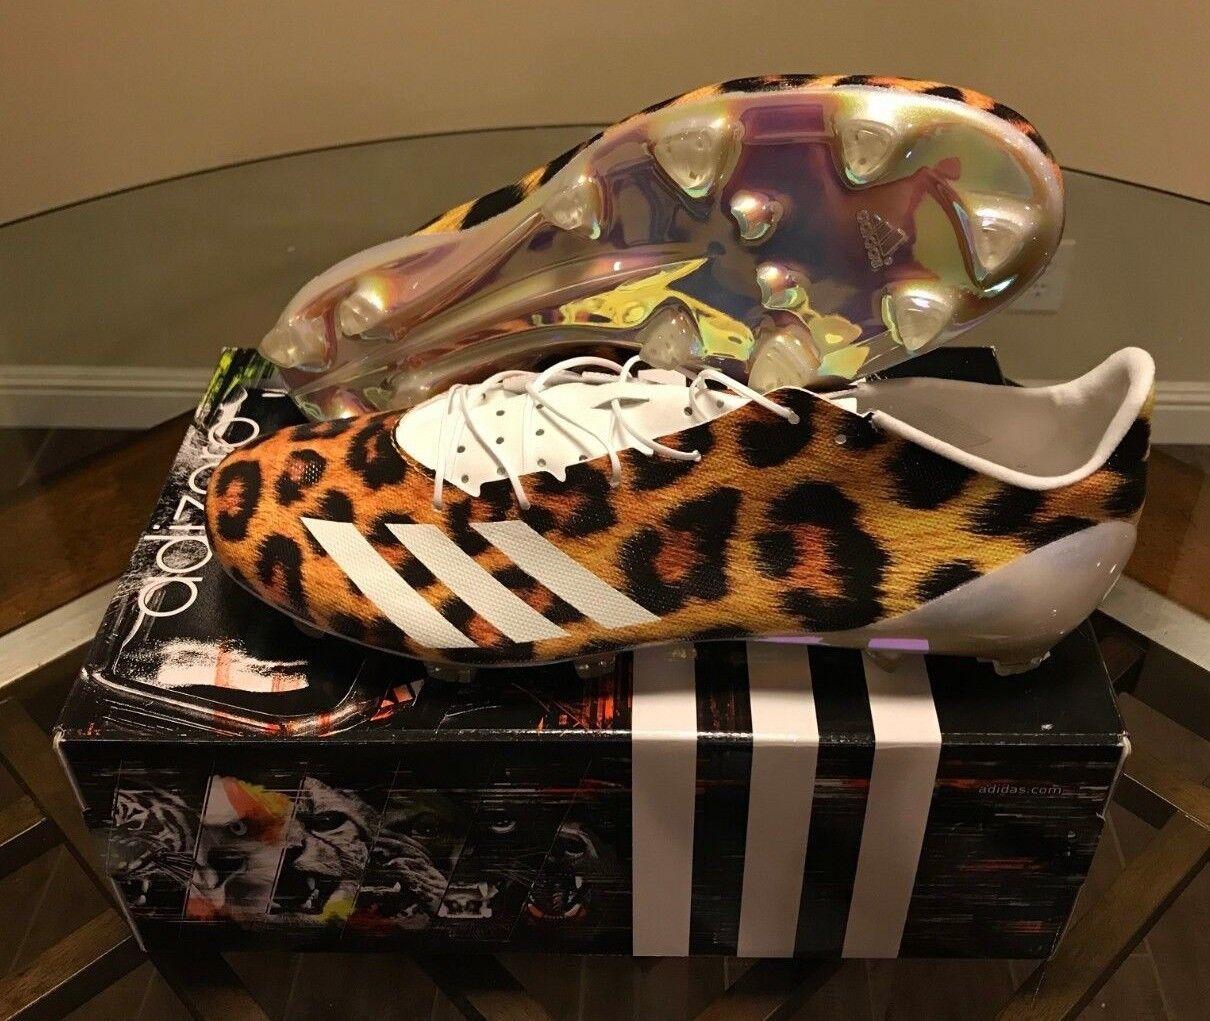 RARE NIB Adidas Adizero 5-Star 40 Uncaged Football Cleats Leopard B42459 Sz 13.5